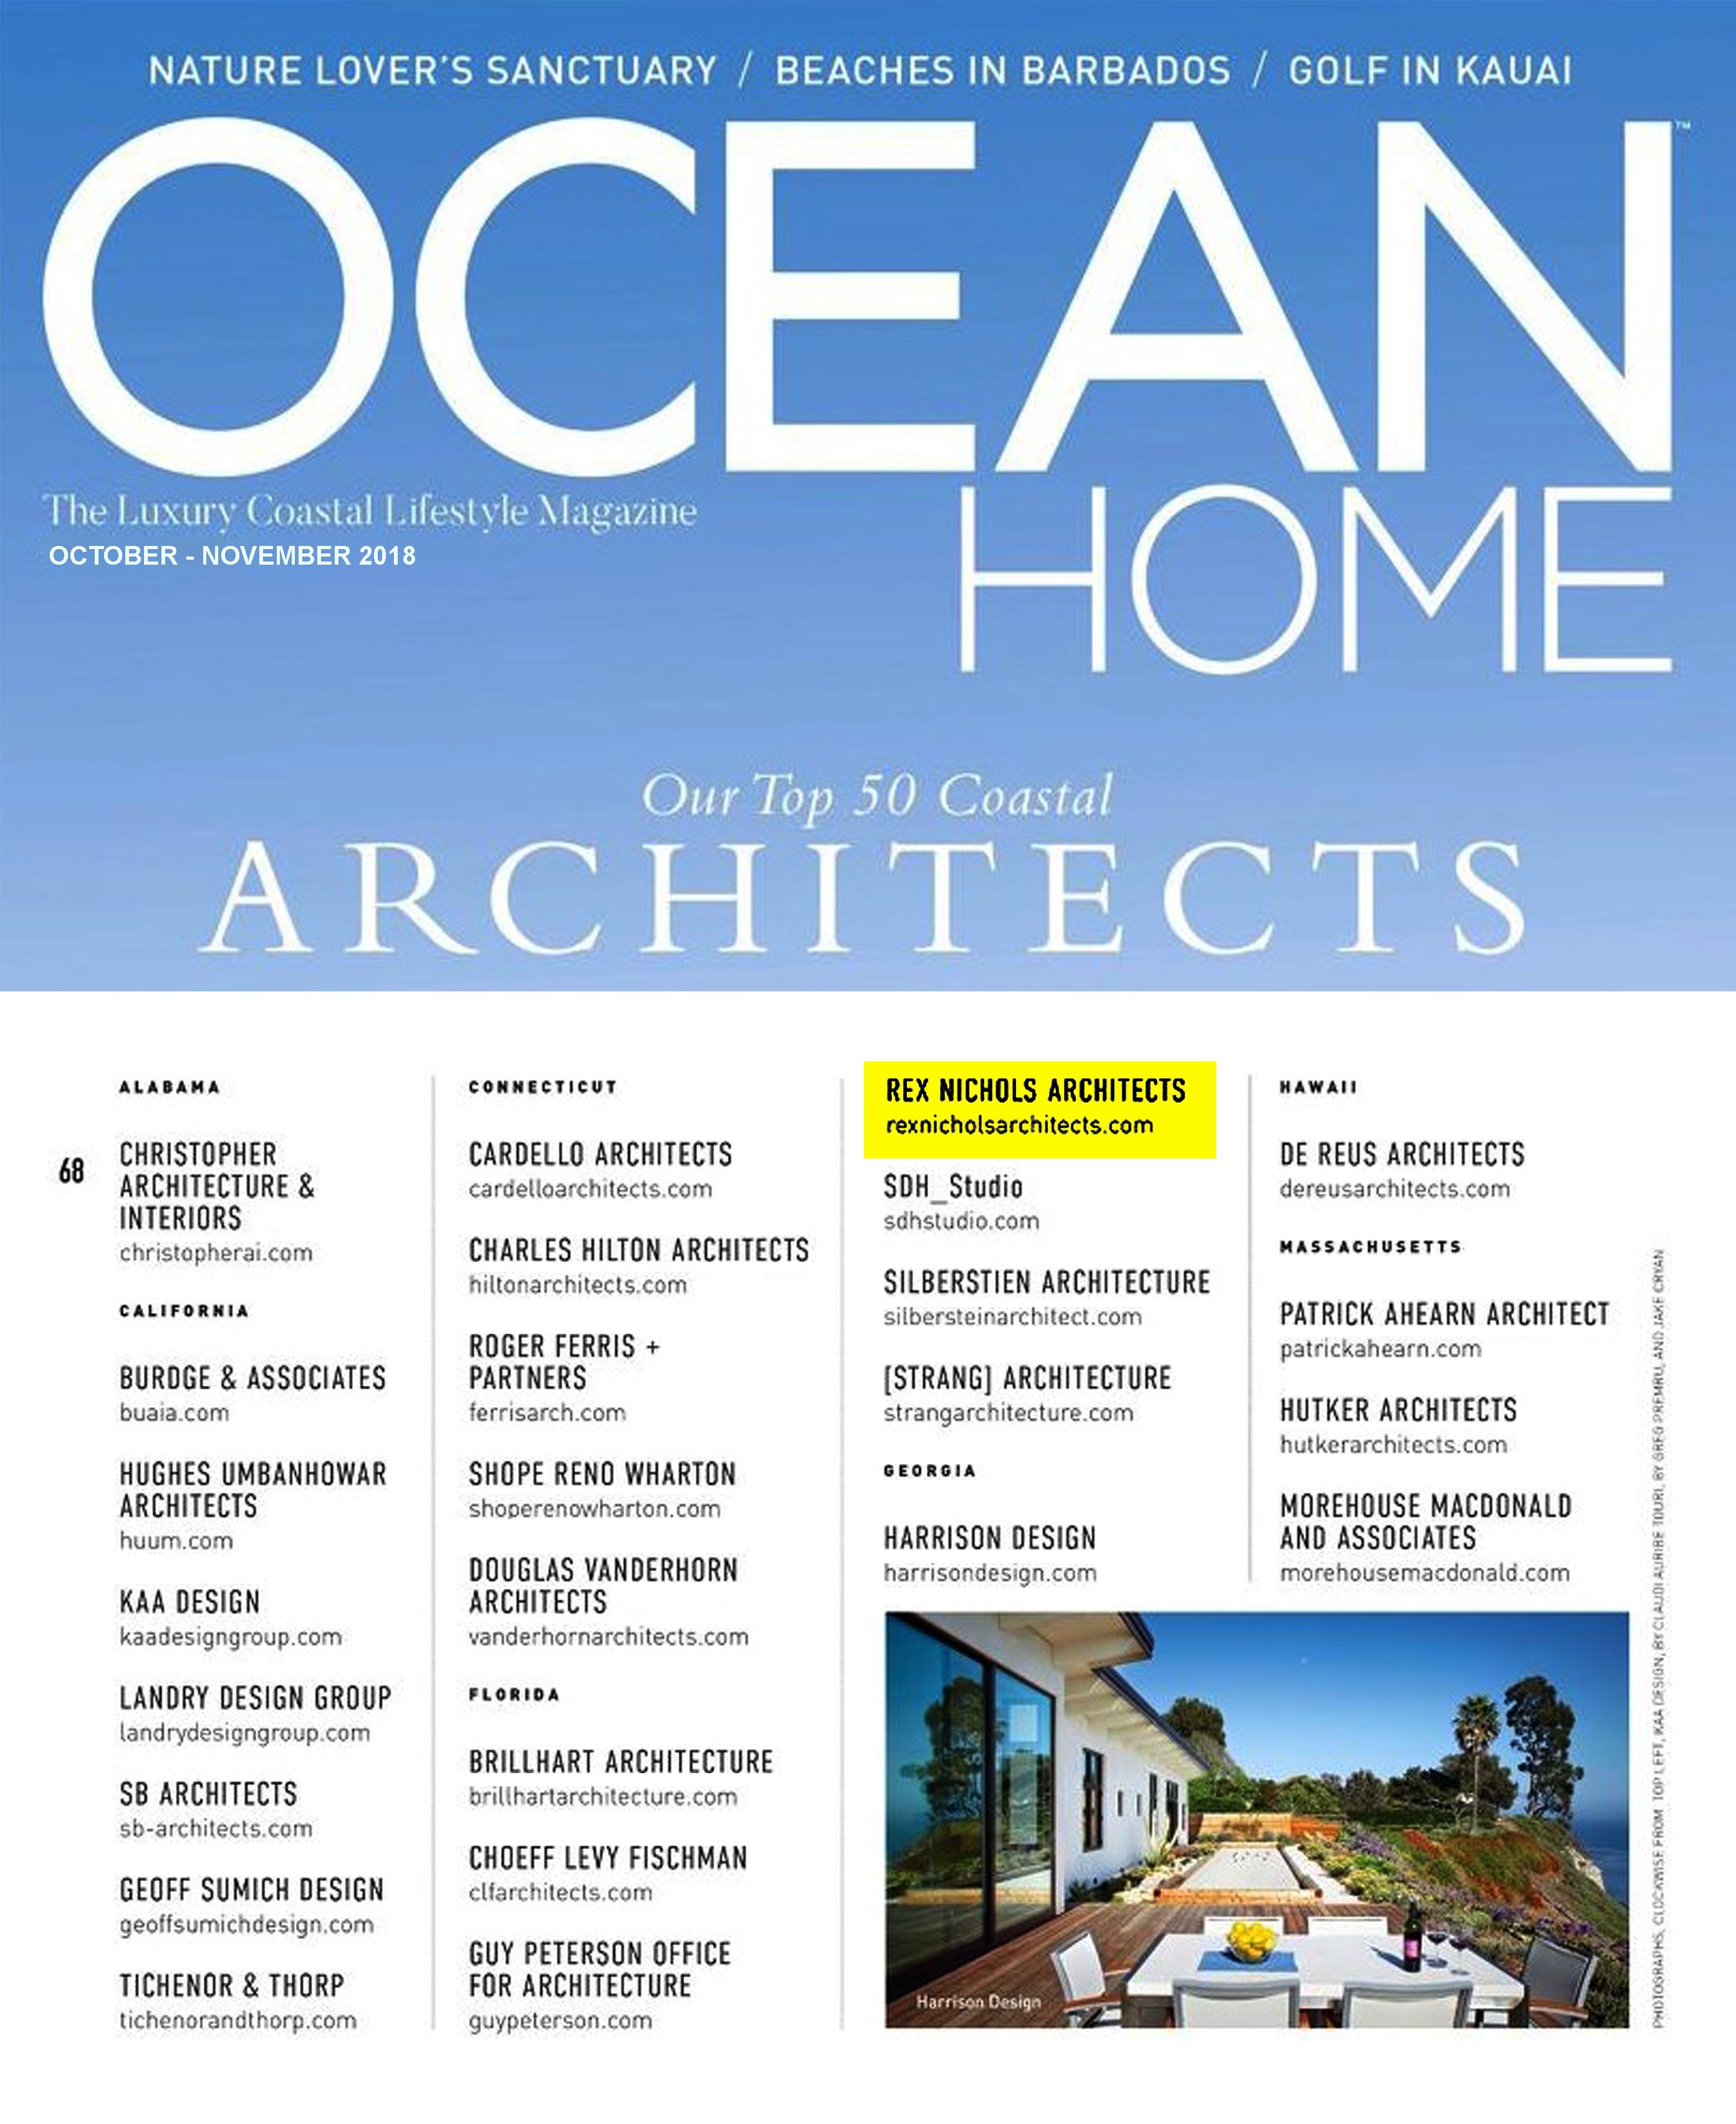 Top 50 Coastal Architects of 2018